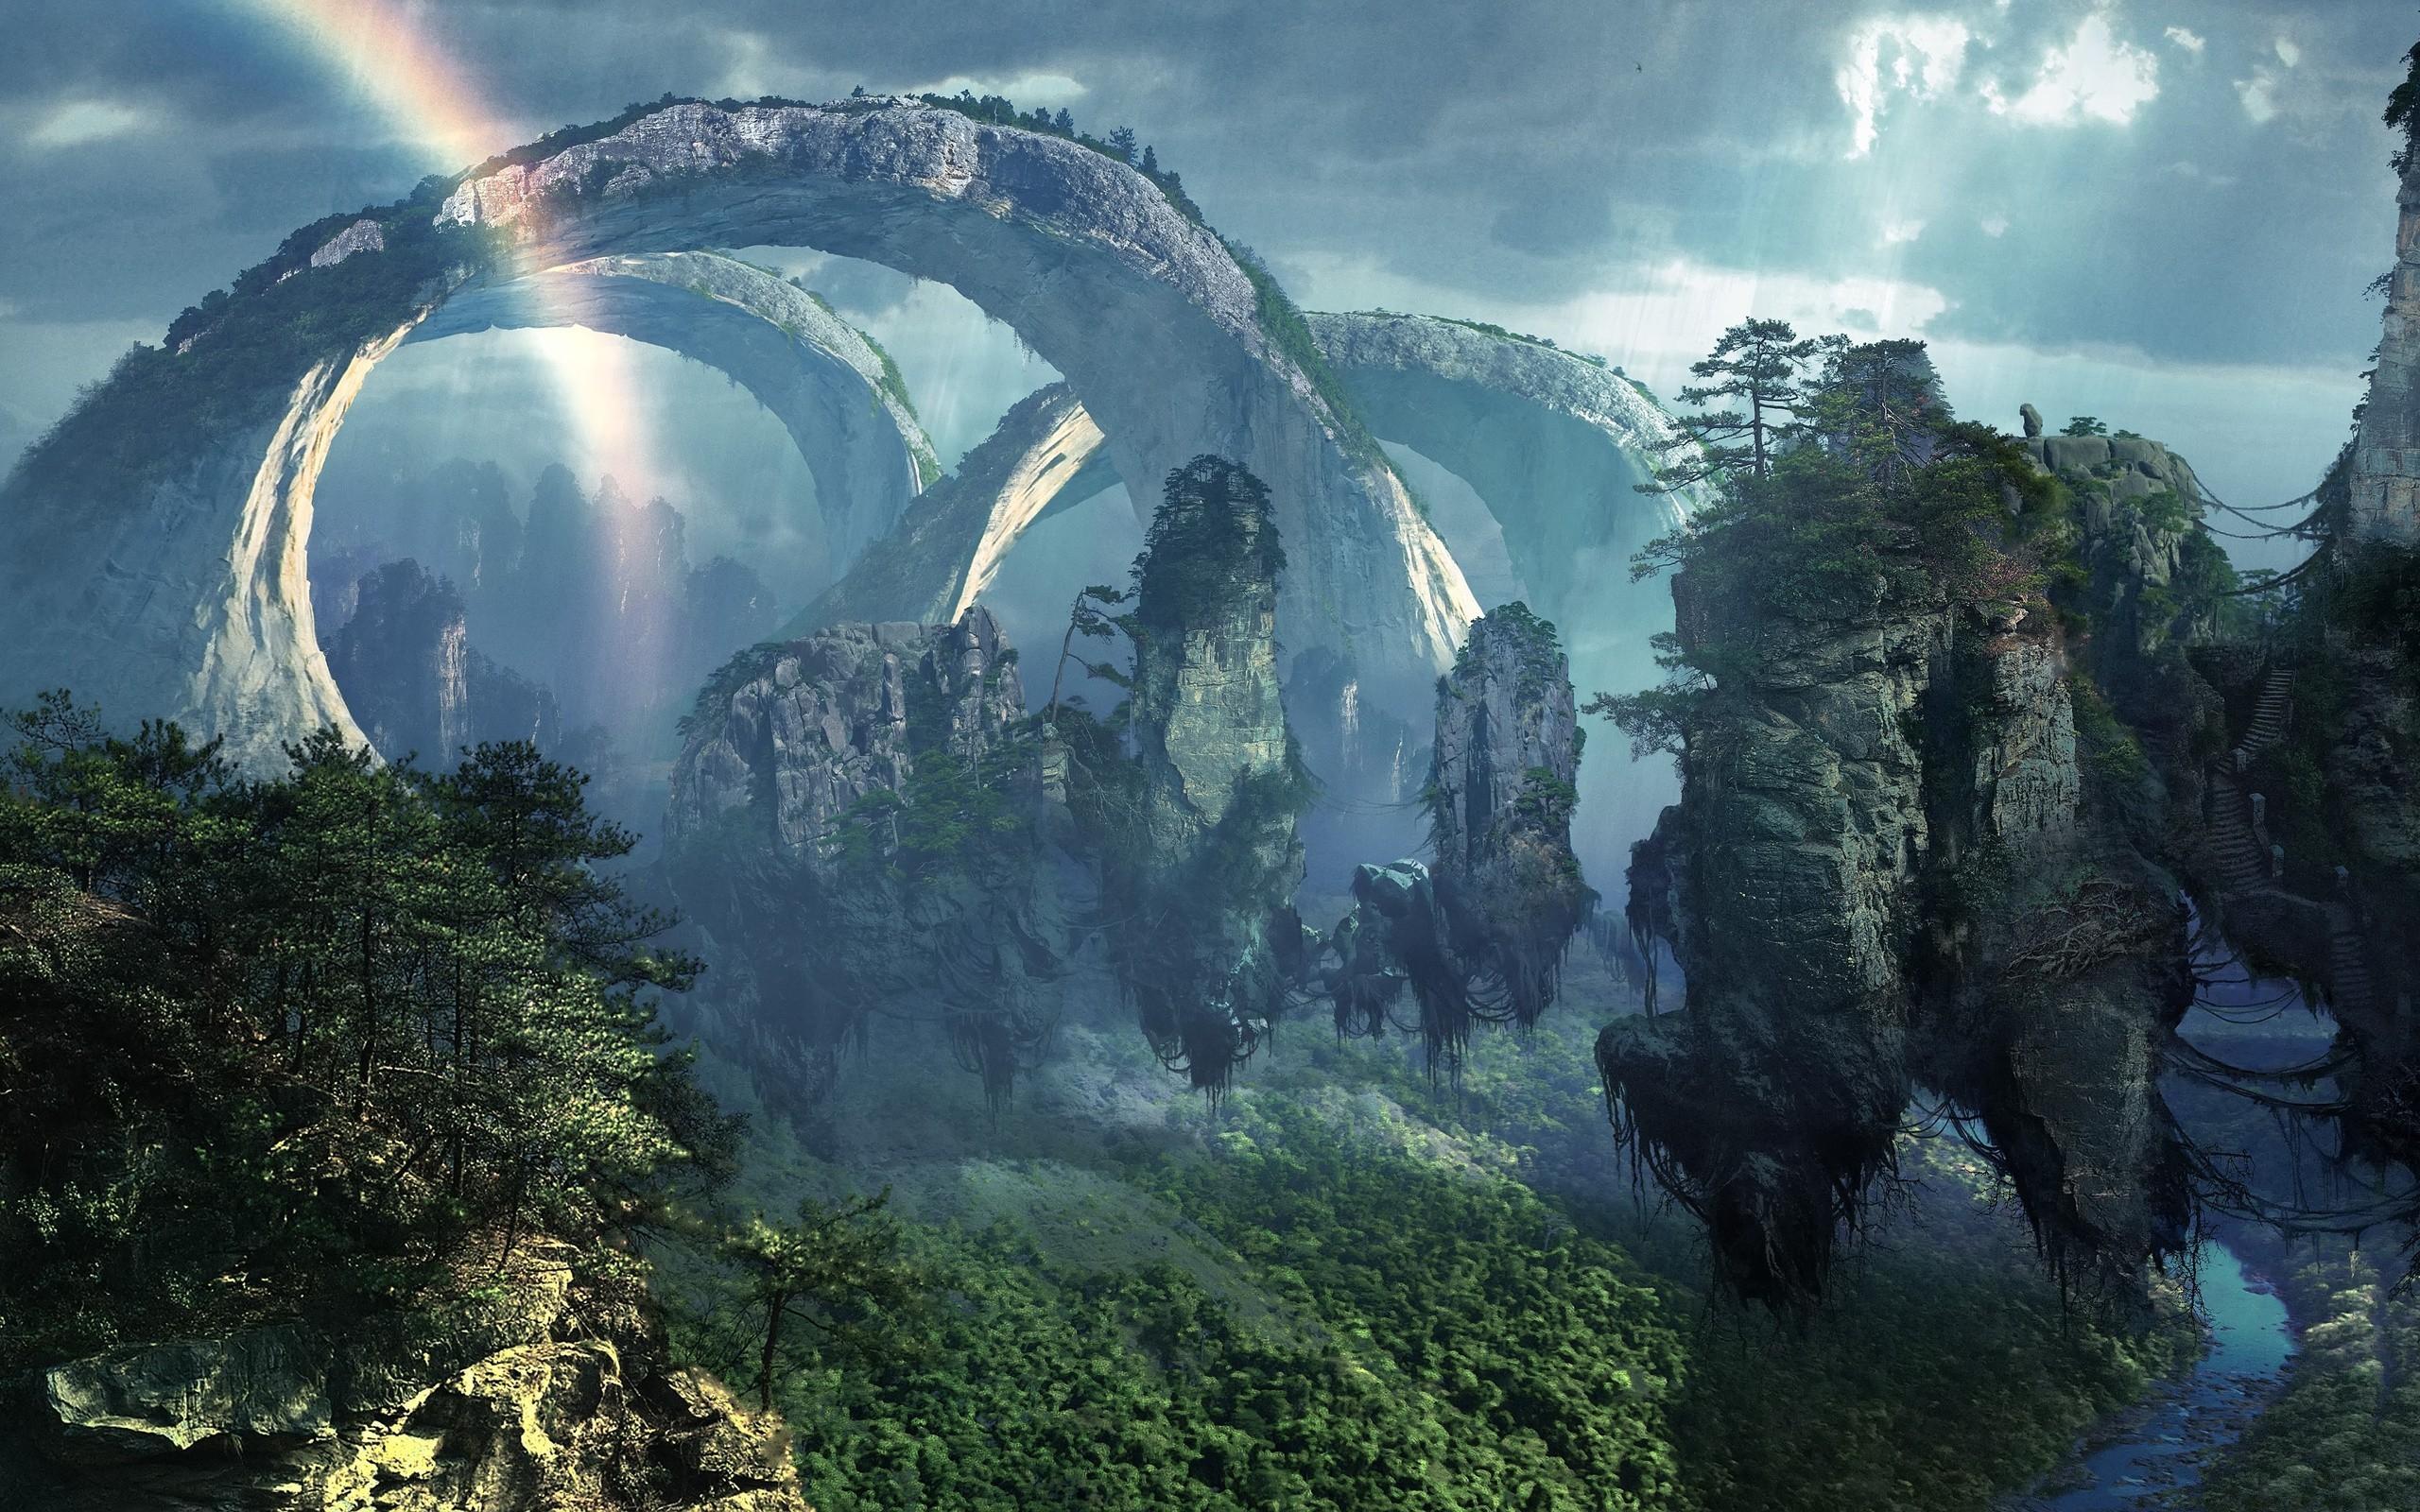 wallpaper.wiki-Fantasy-Alien-Planet-Image-PIC-WPD003920-